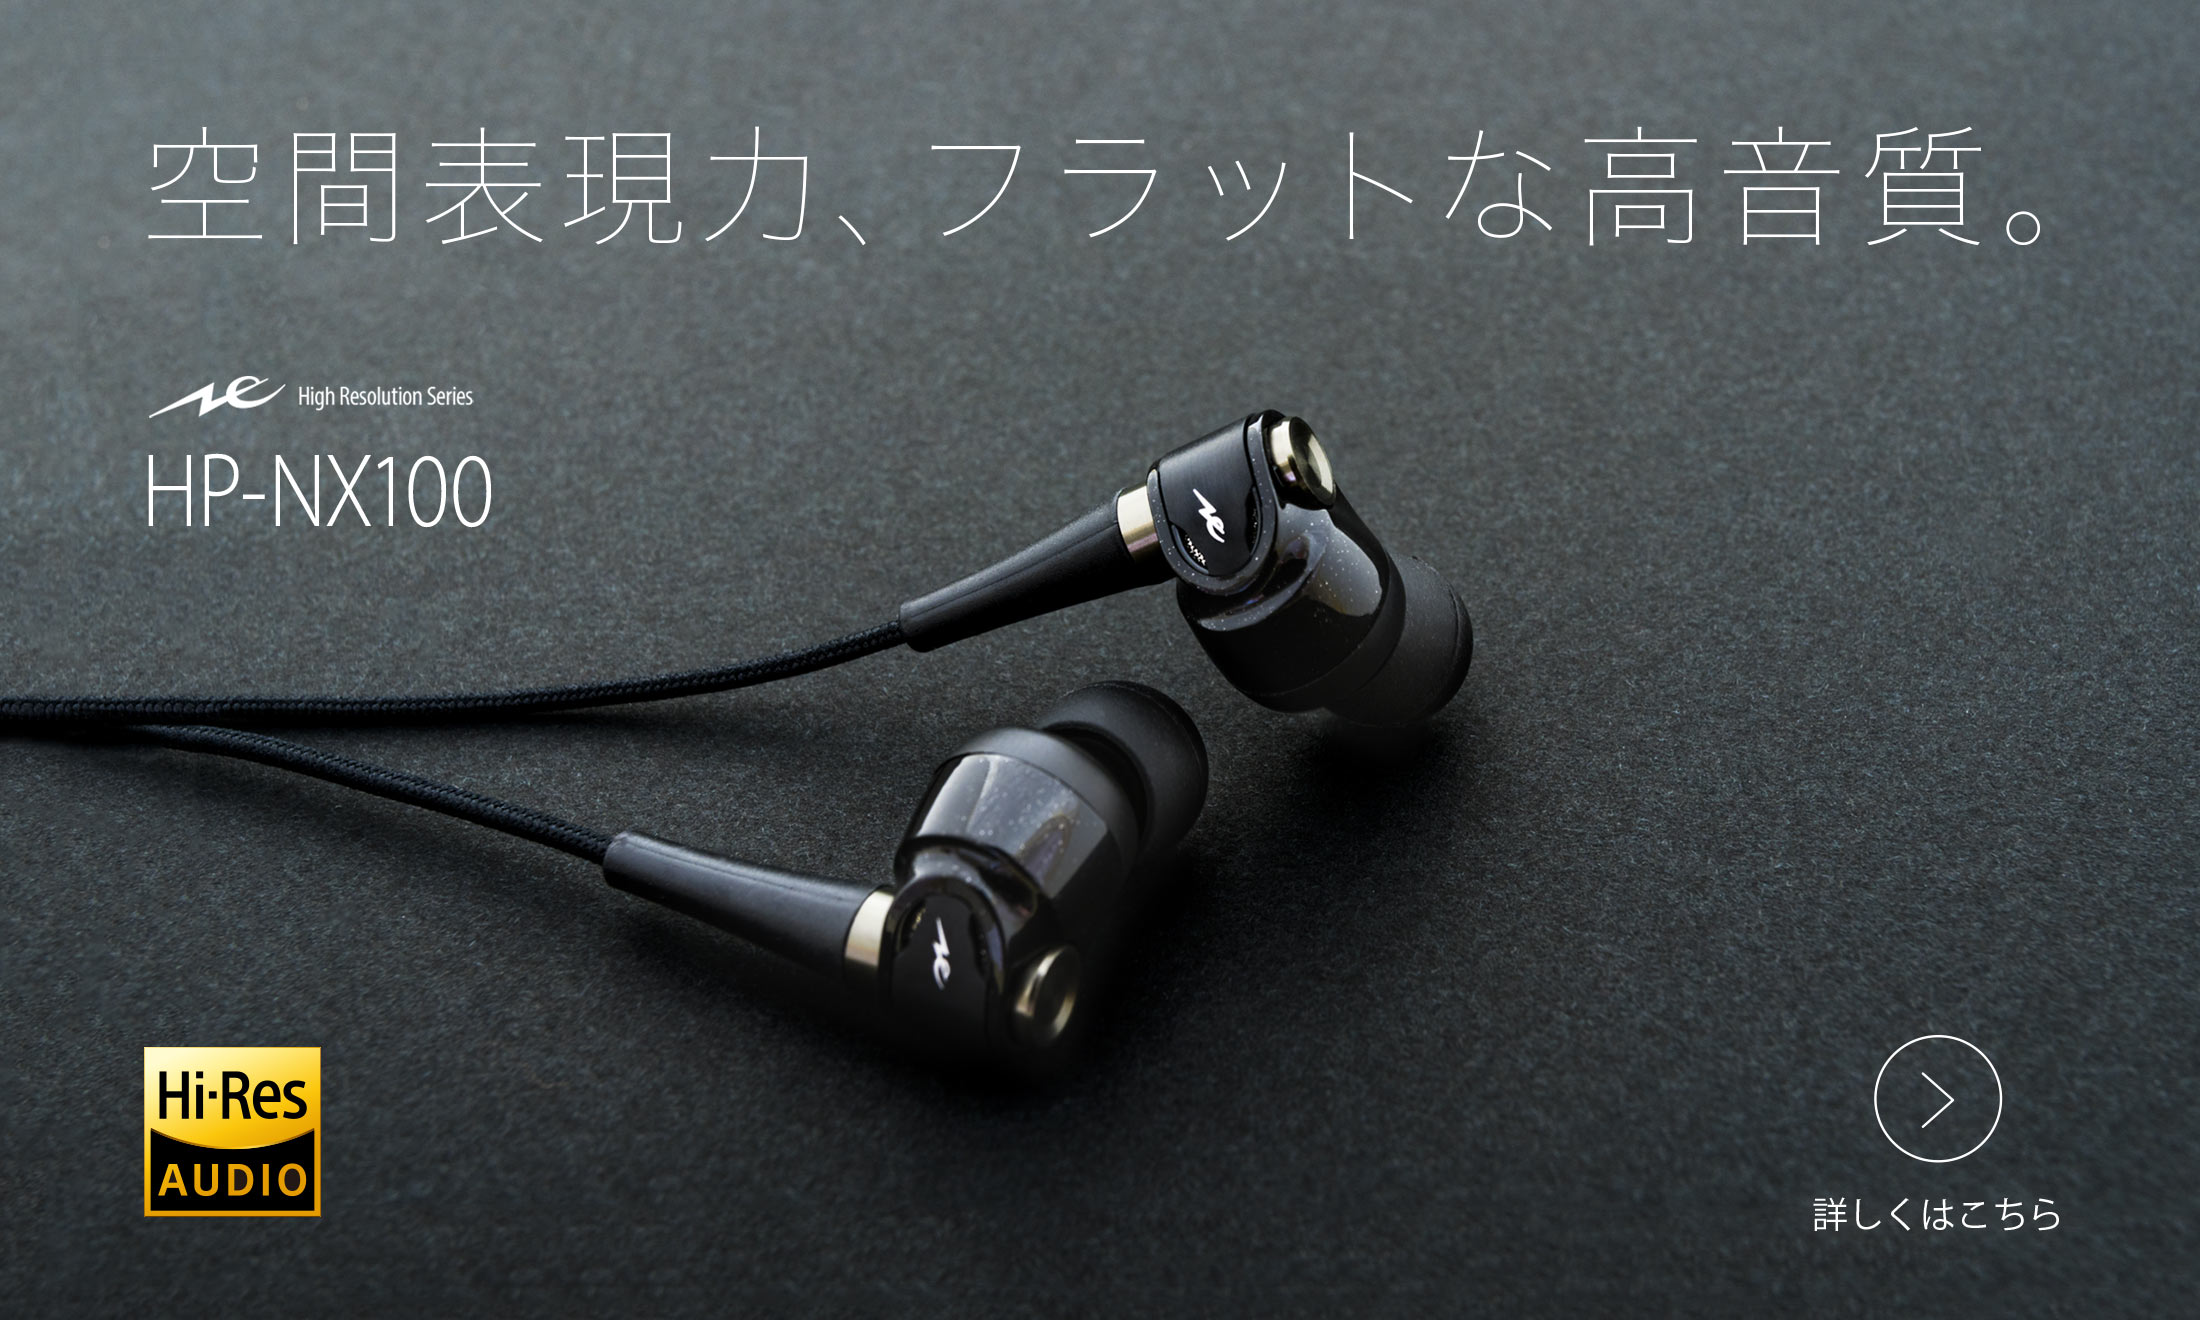 HP-NX100